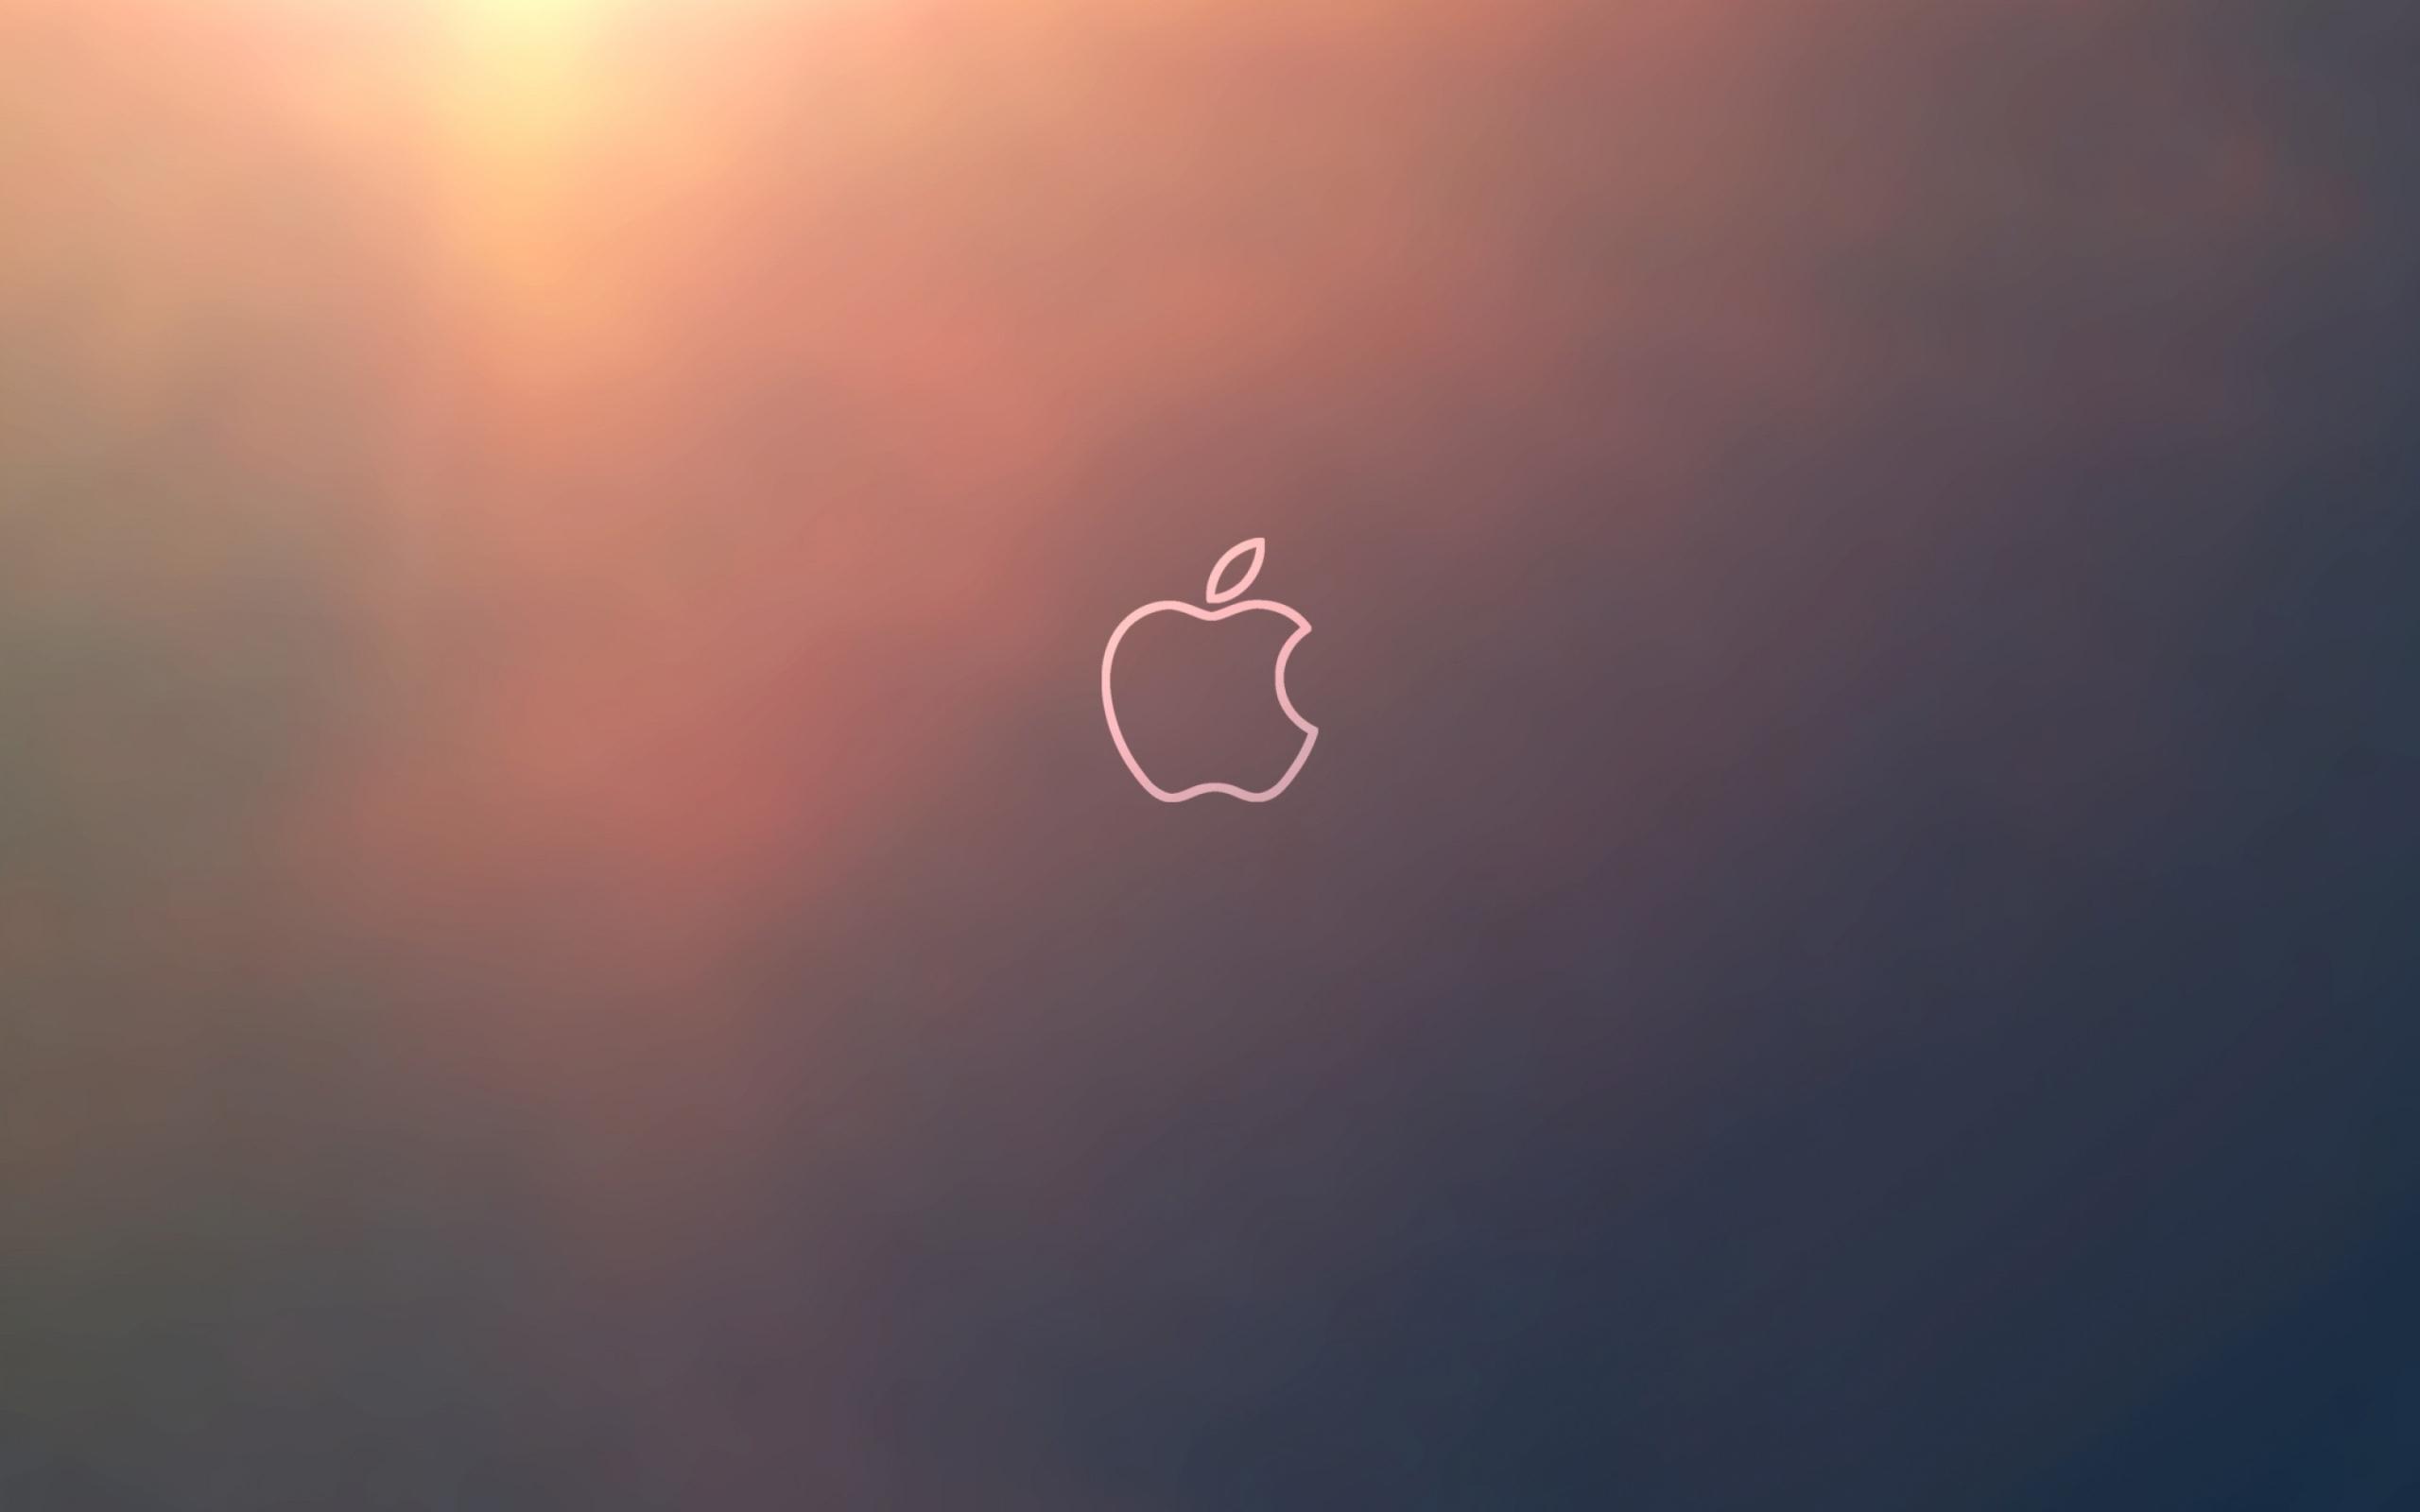 macbook pro retina apple wallpaper wallpaper details :